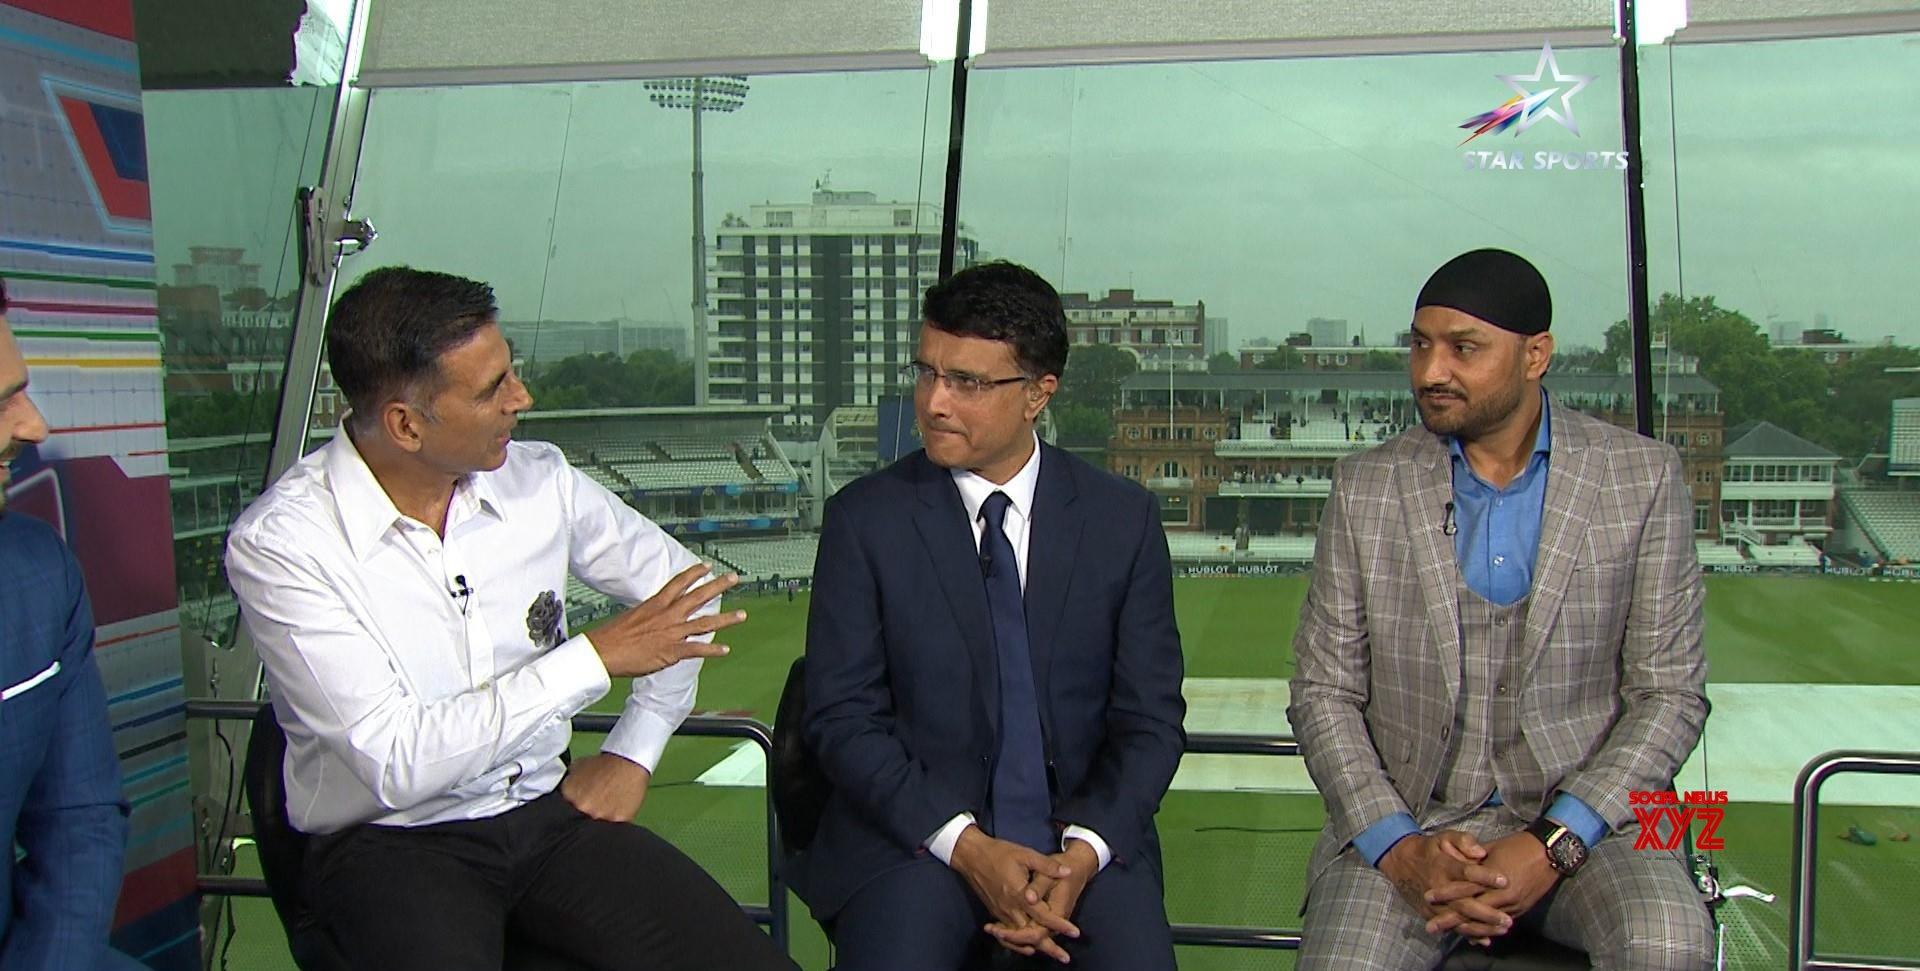 London: Akshay Kumar, Irfan Pathan, Sourav Ganguly, Harbhajan Singh on Philips Hue Cricket Live #Gallery